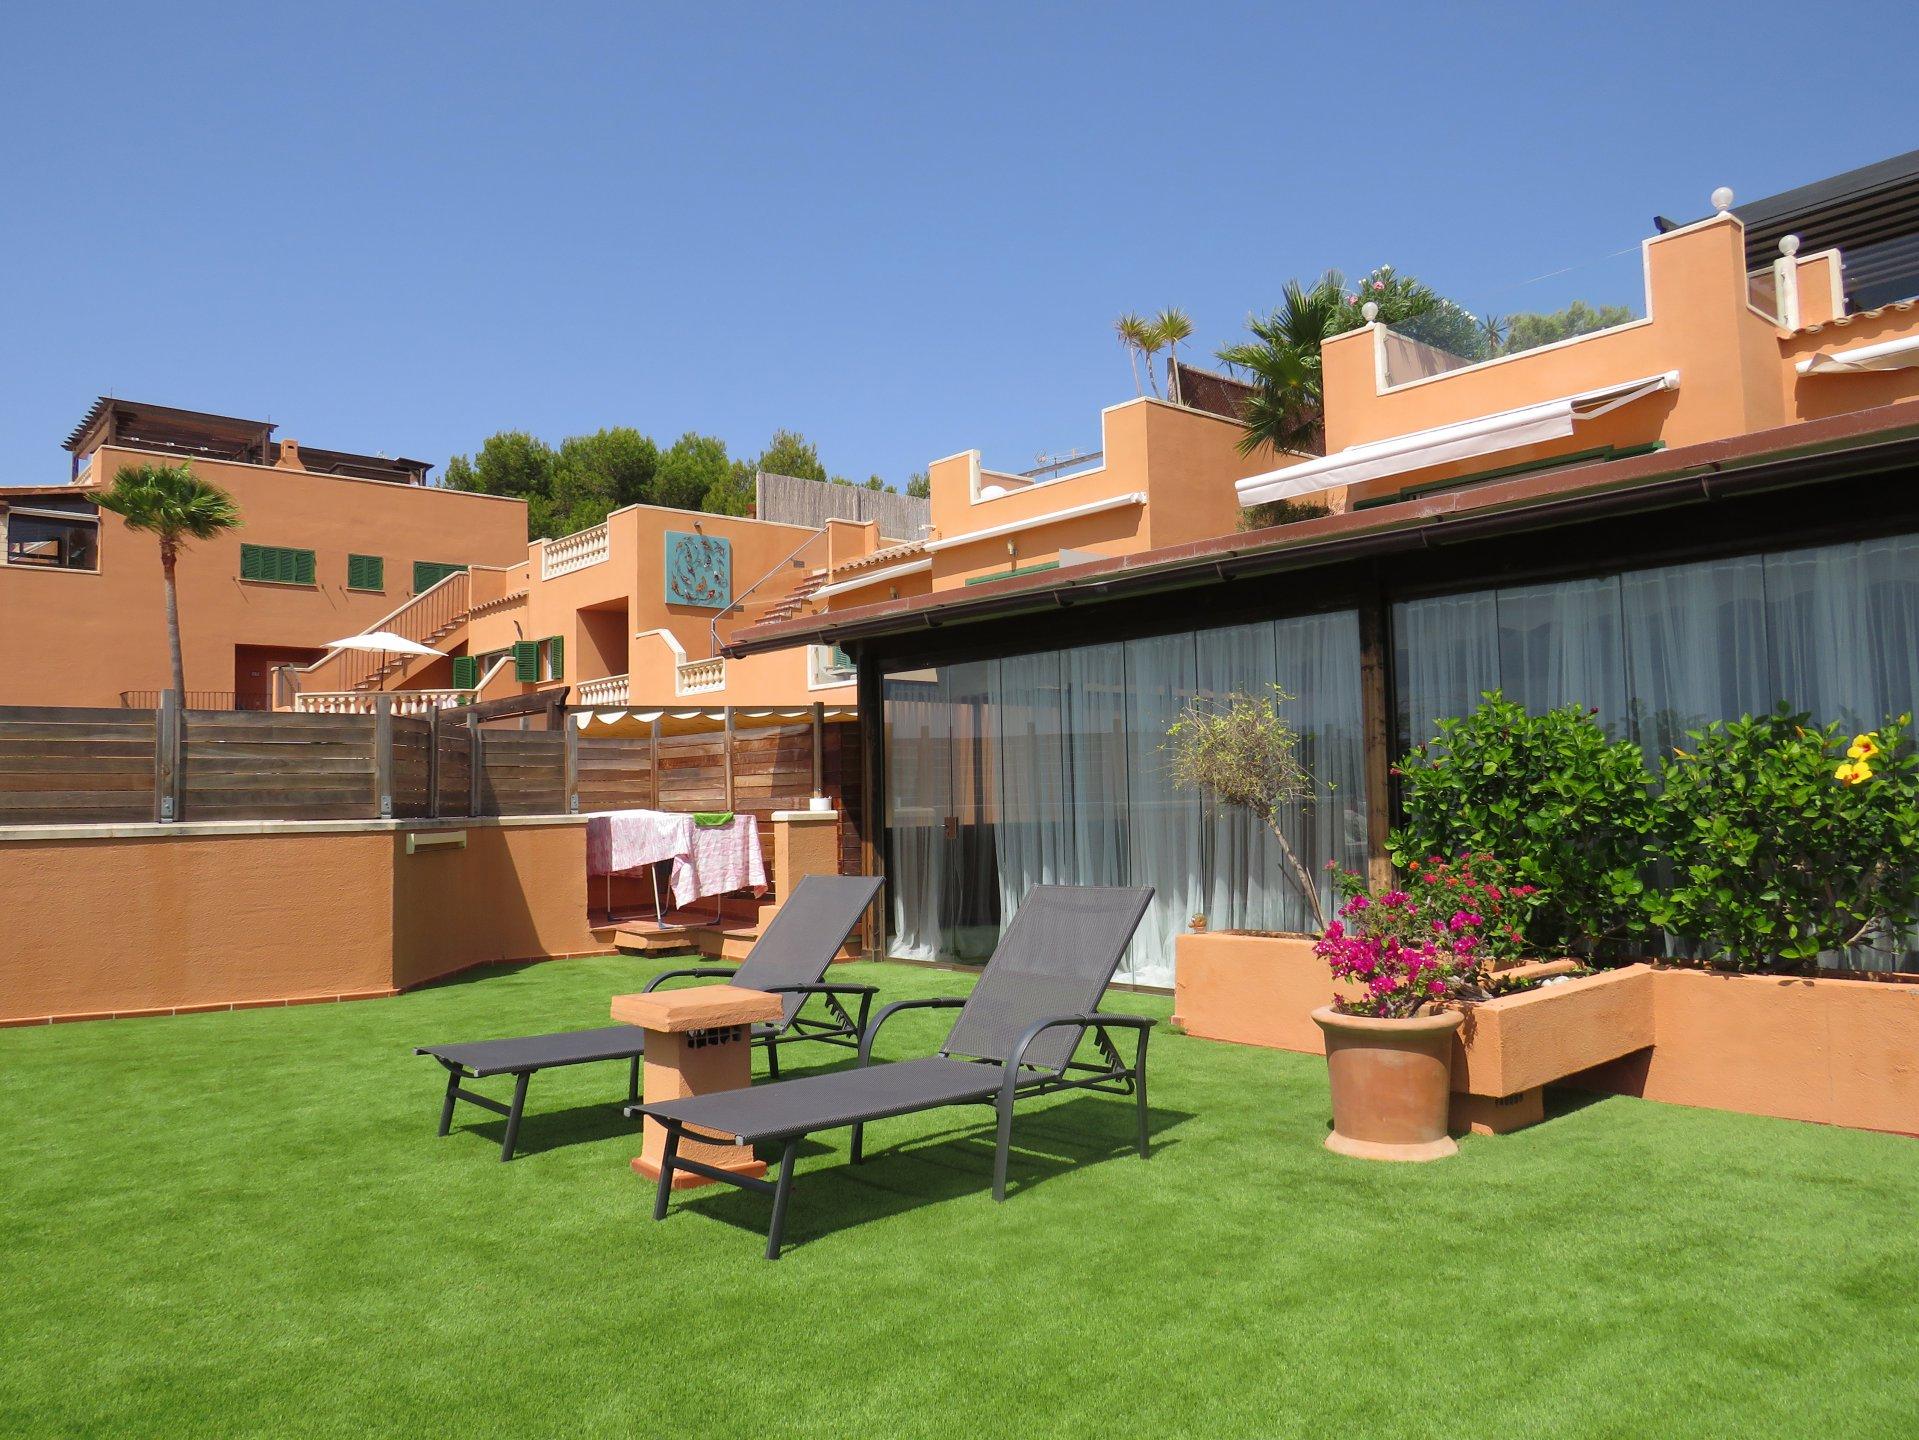 Ad Sale Apartment Santa Ponsa (07180) ref:V0378SP